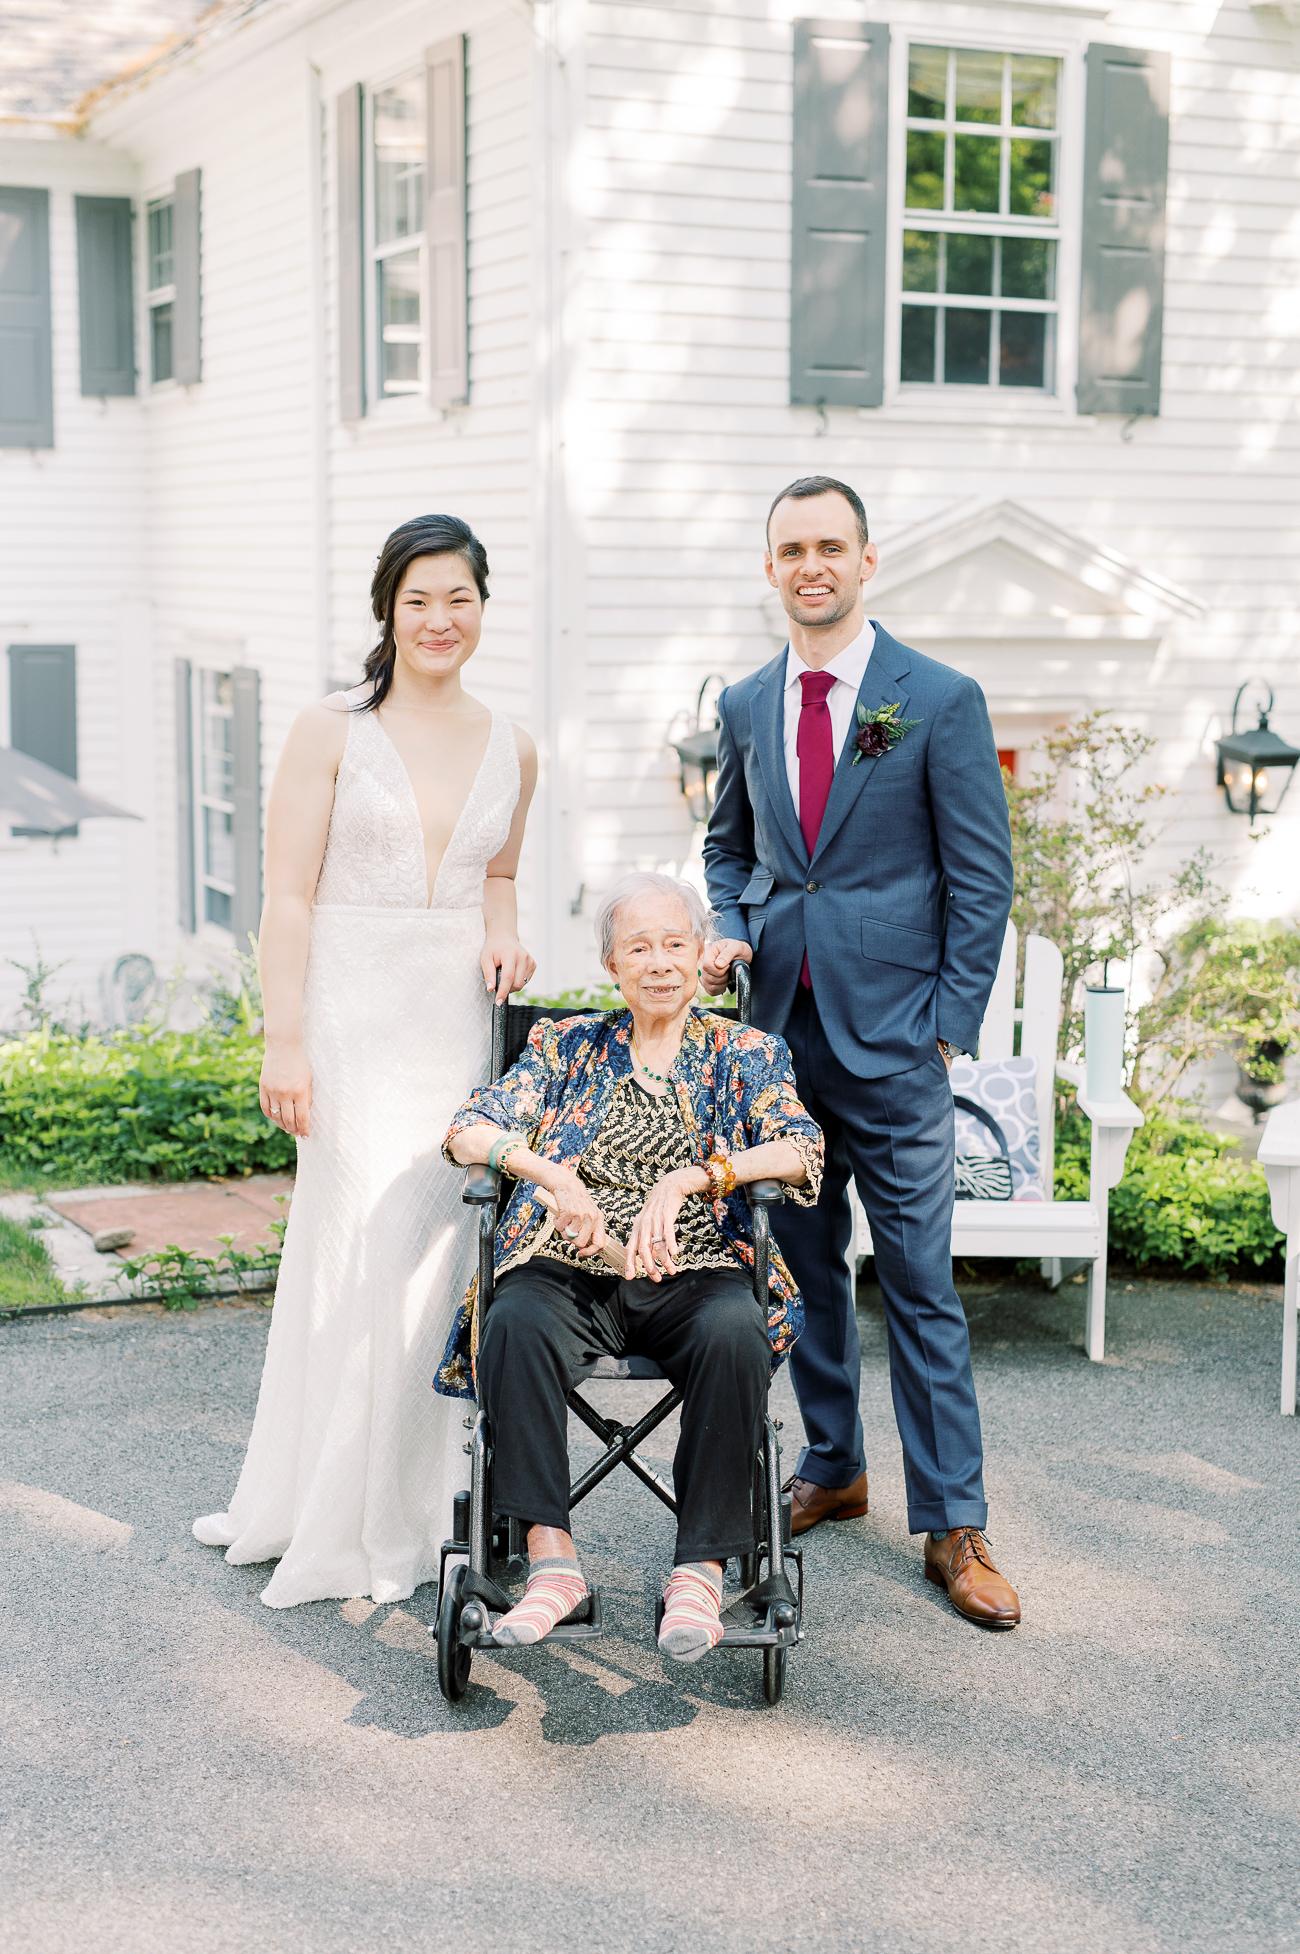 Sarah and Justin with Sarah's great grandma